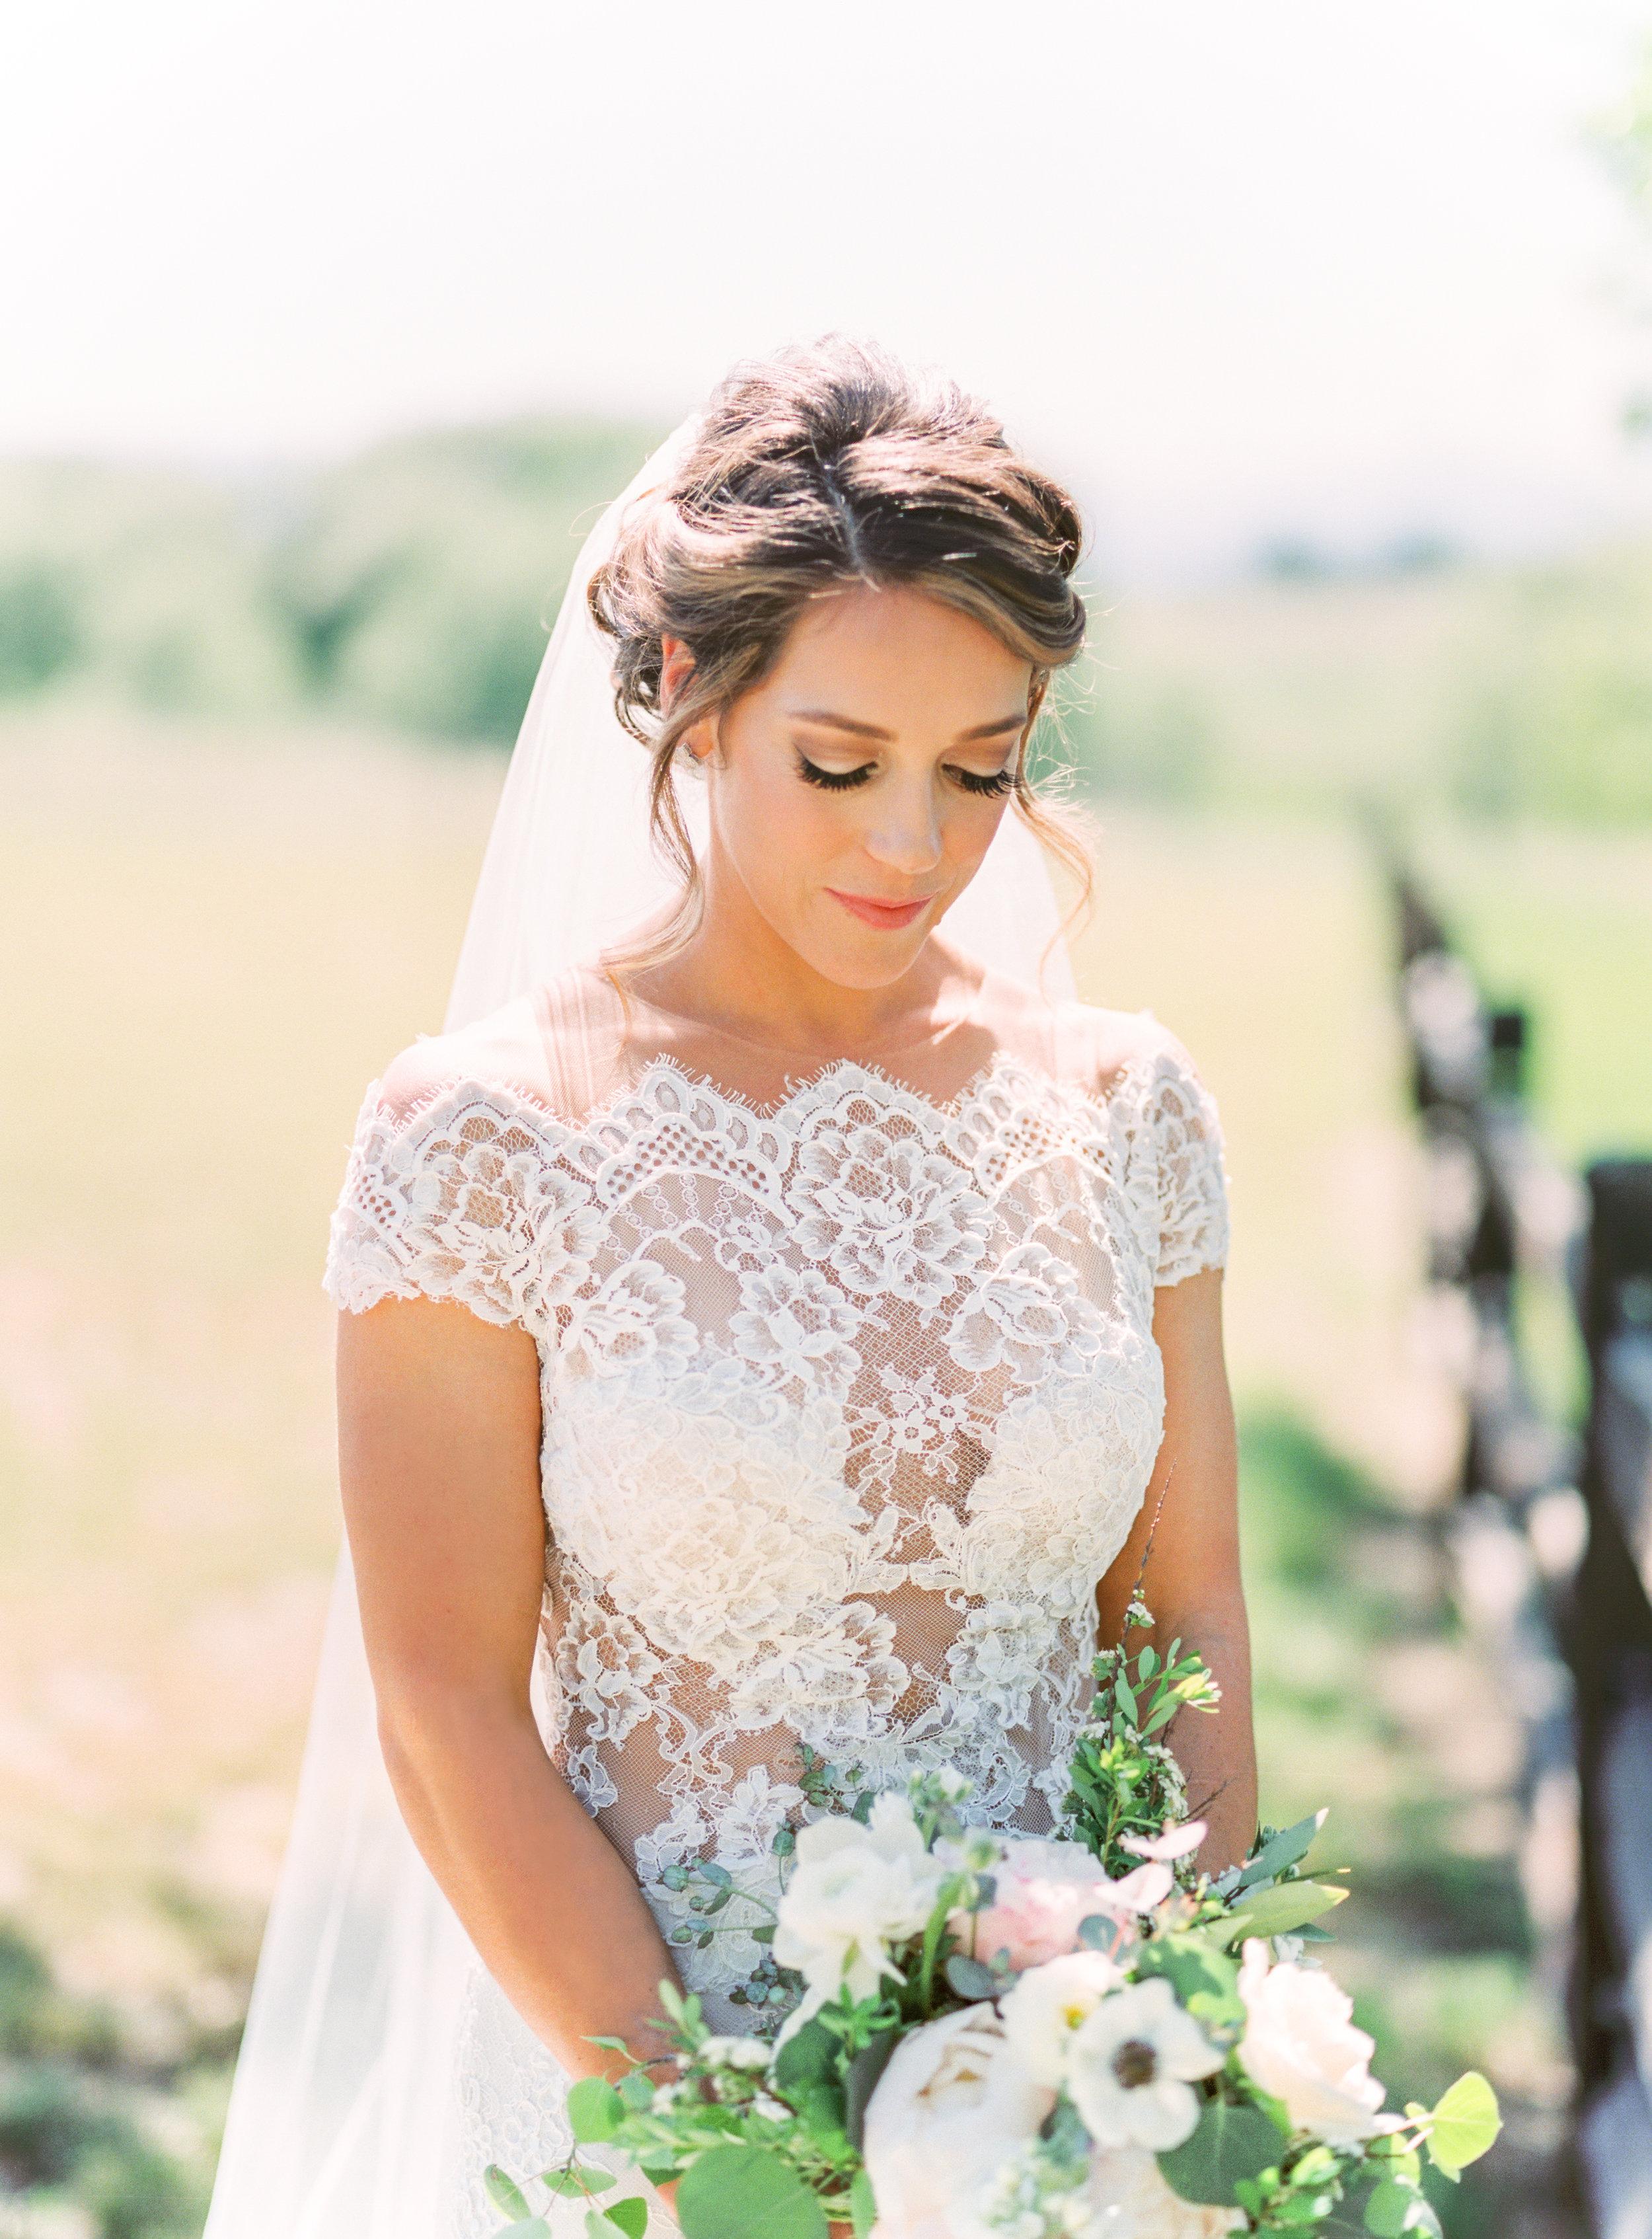 Kathryn-Allen-Boulder-wedding-2018-by-Lisa-ODwyer-131.jpg